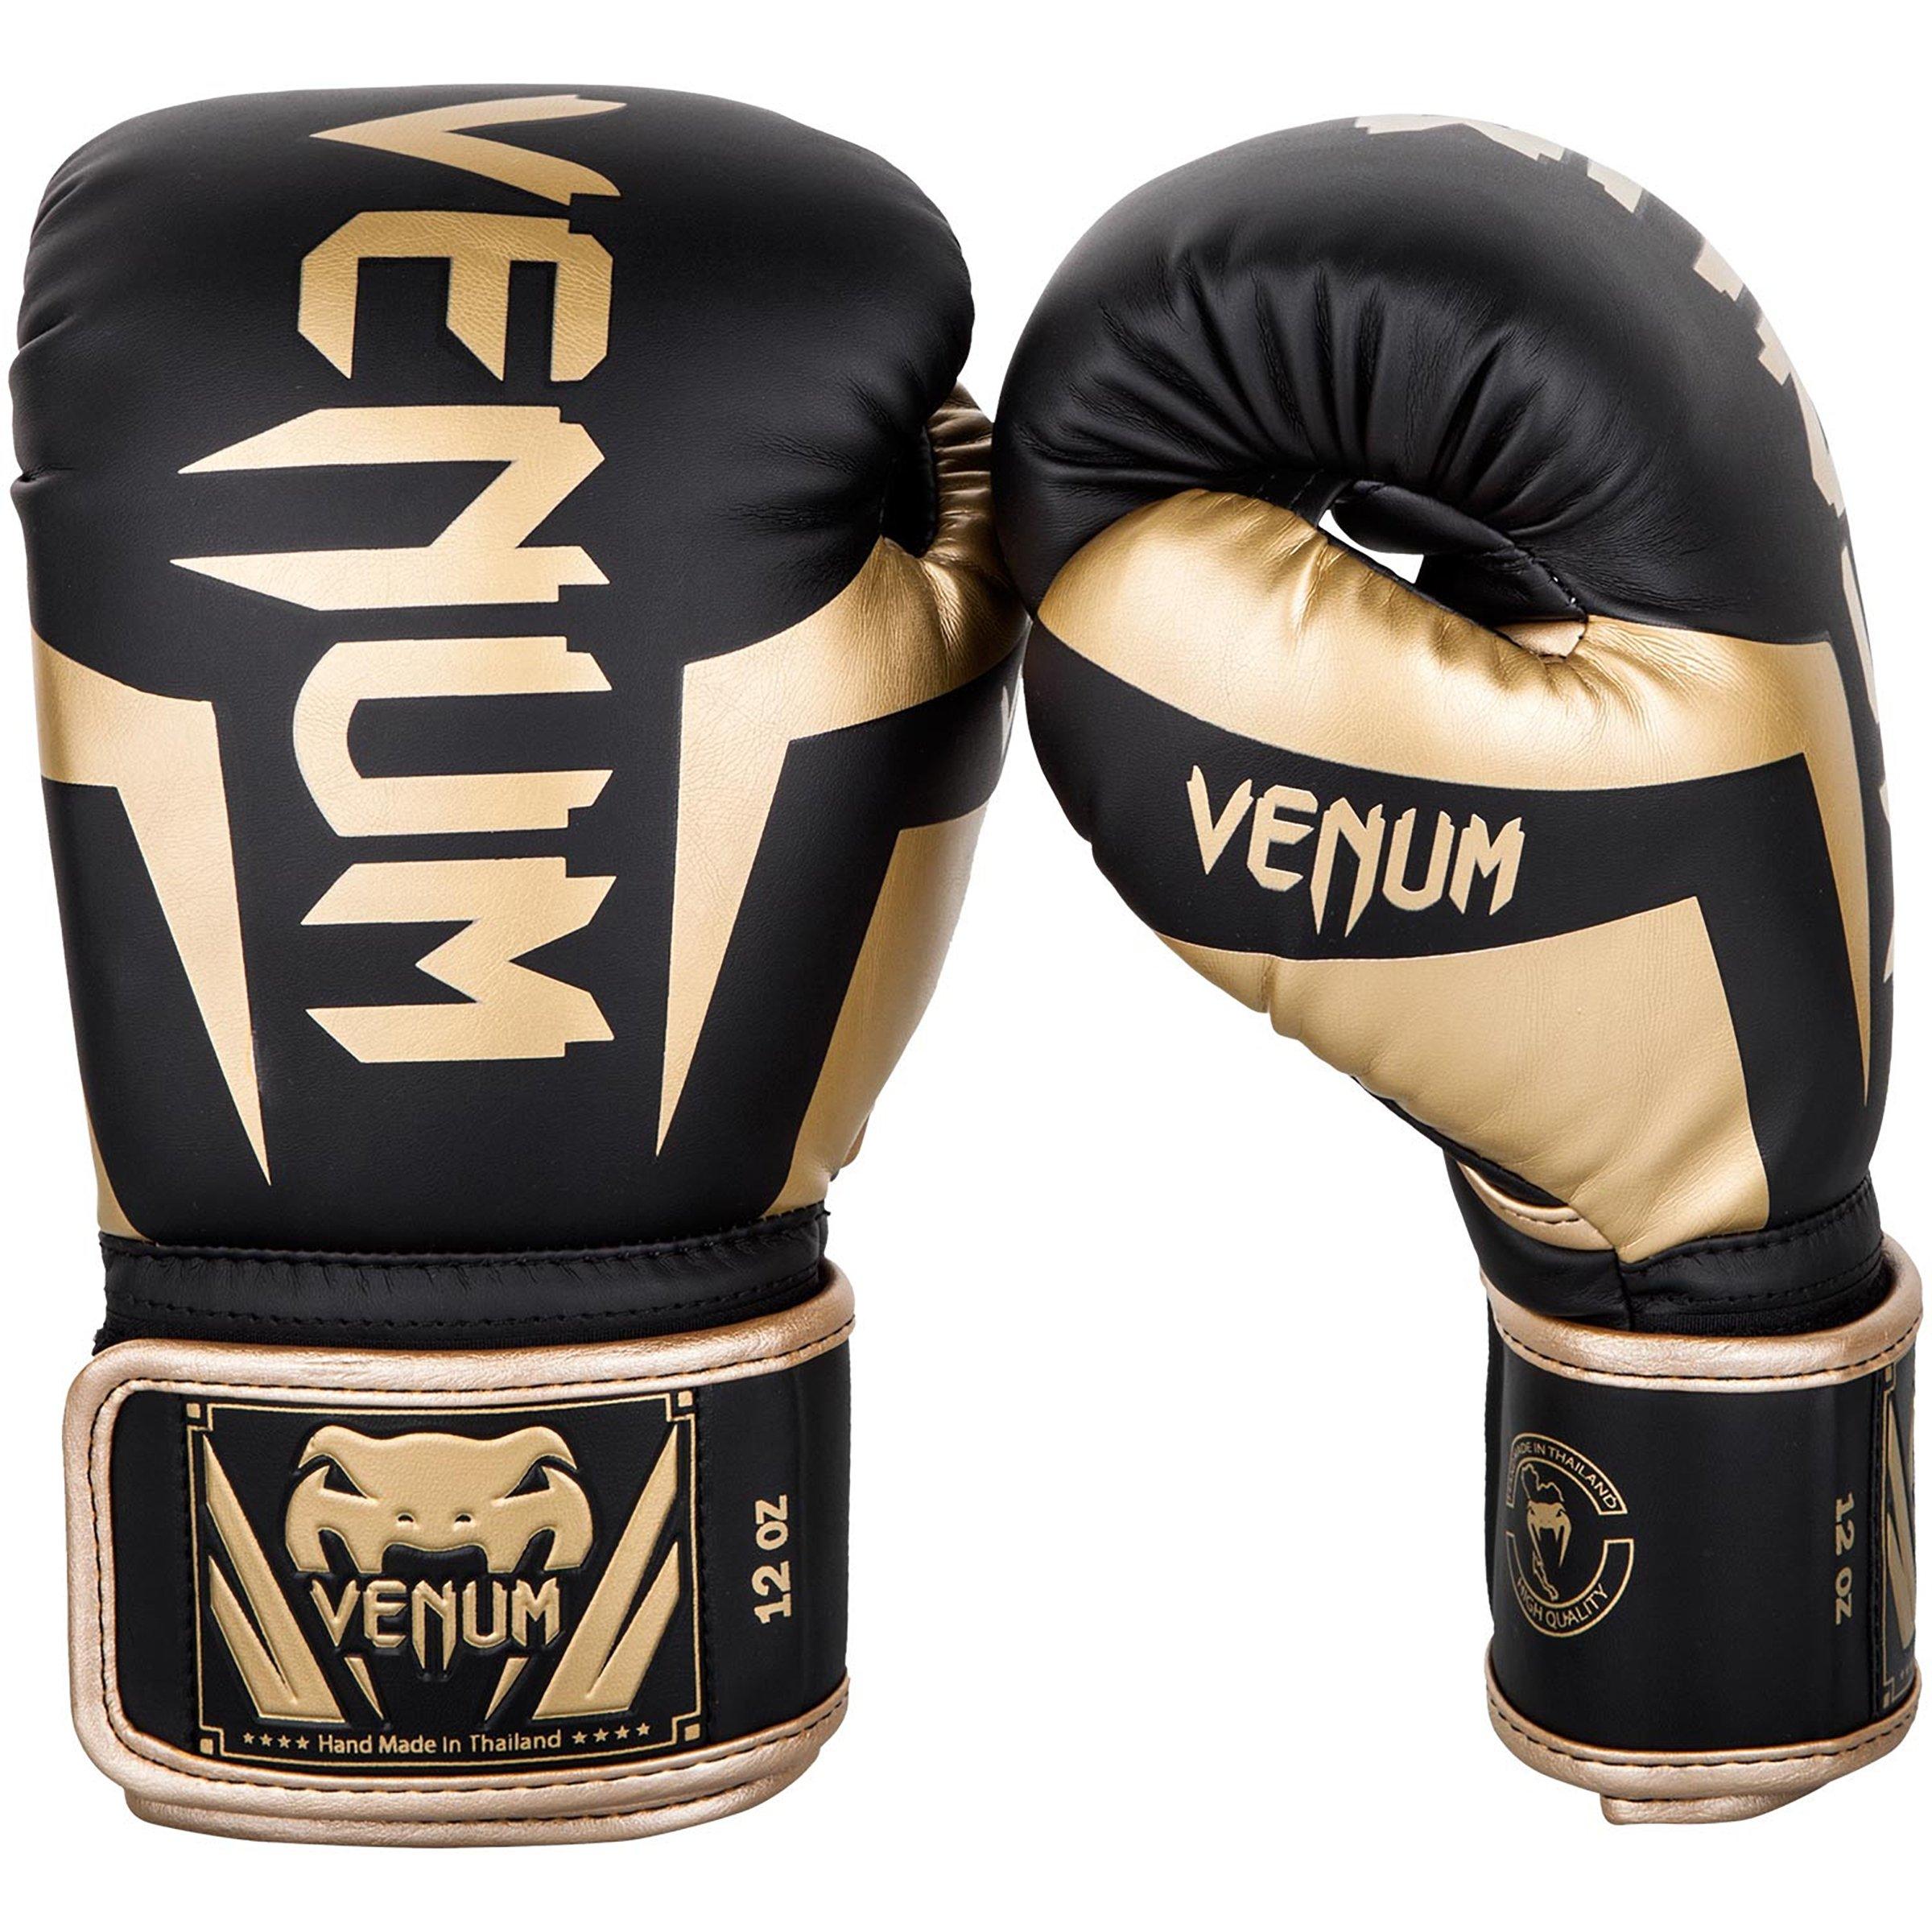 Venum Elite Boxing Gloves - Black/Gold - 10oz